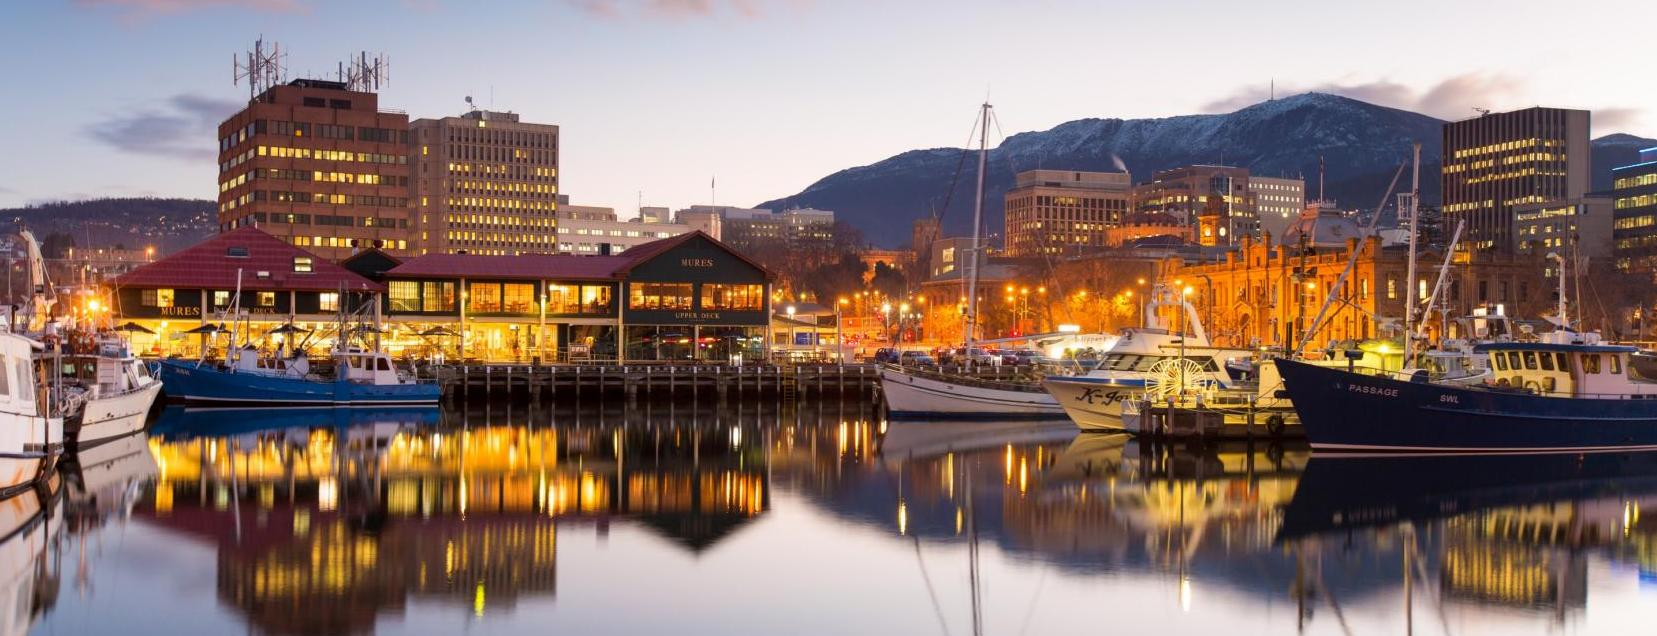 Hobart City is at your door step...